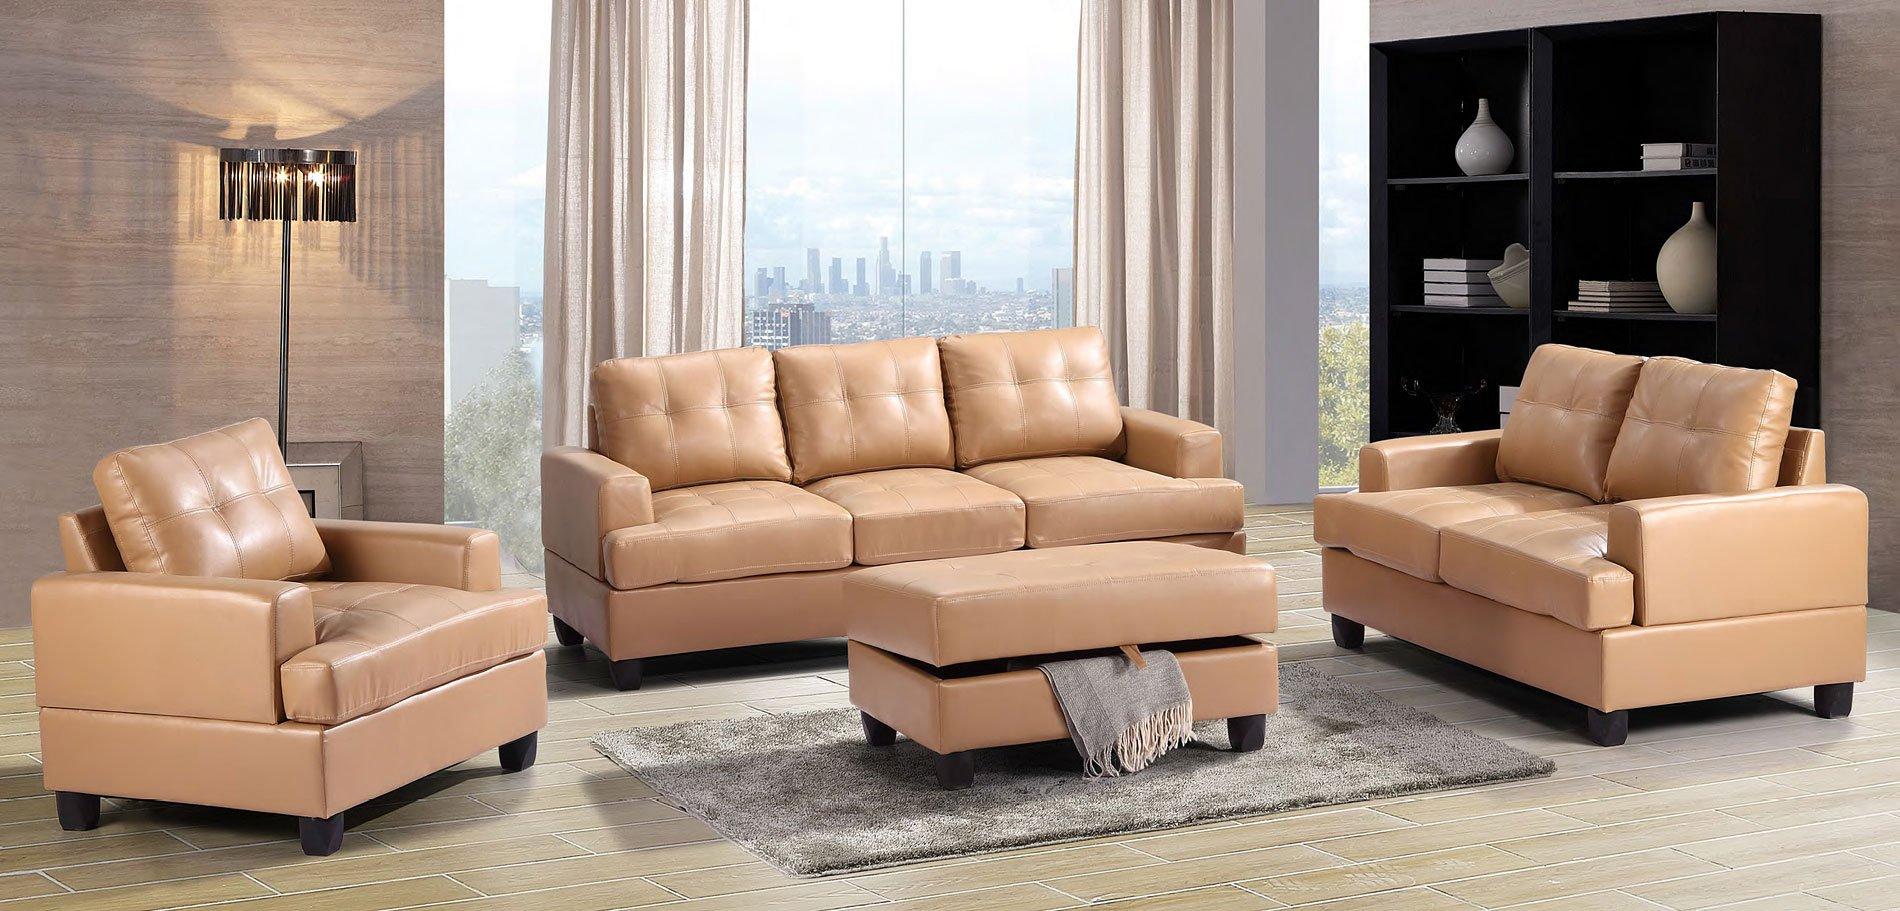 G581 Living Room Set (Tan)